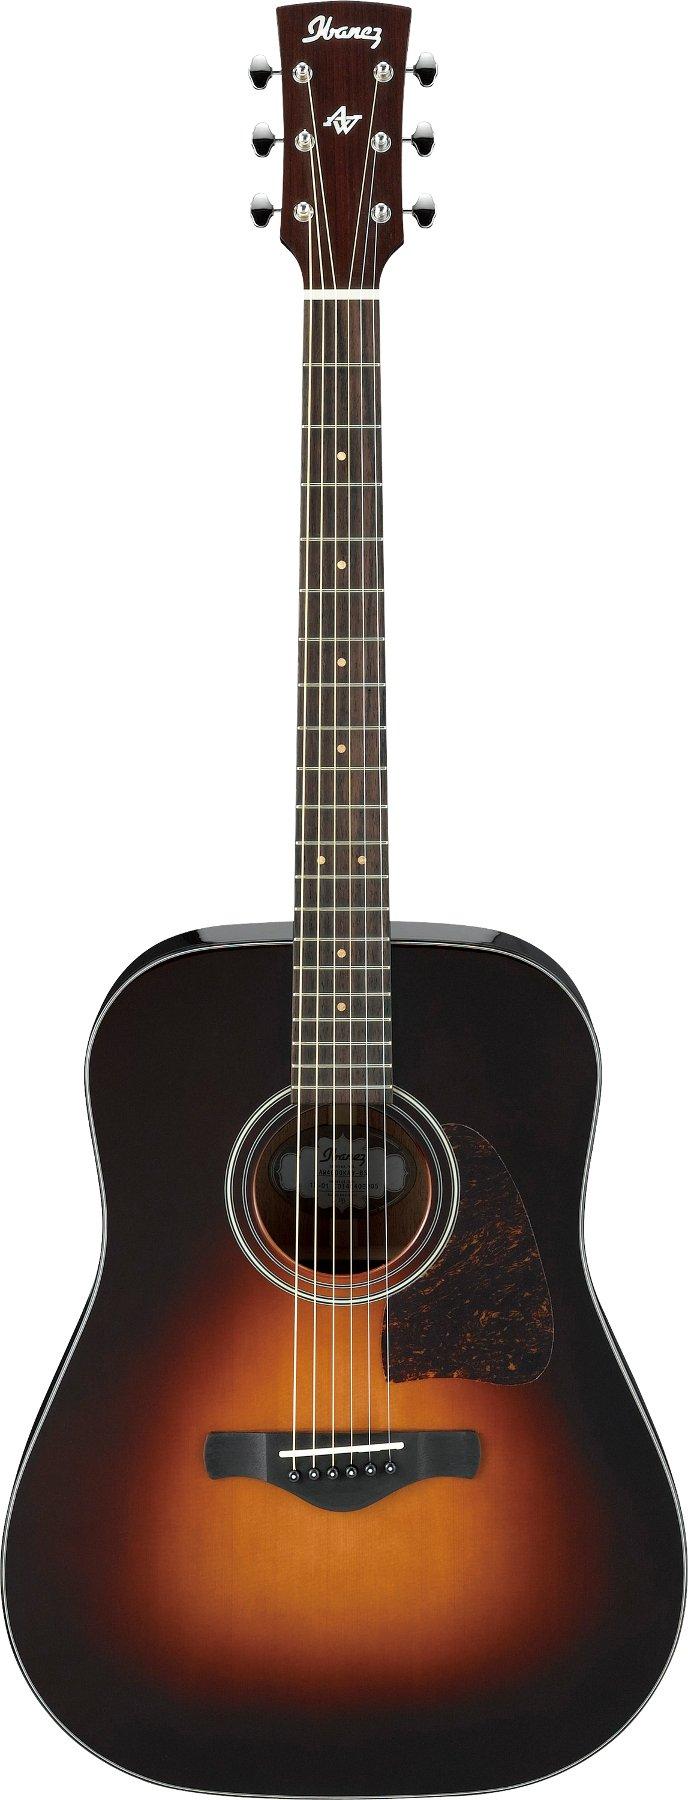 Brown Sunburst High Gloss Artwood Acoustic Guitar